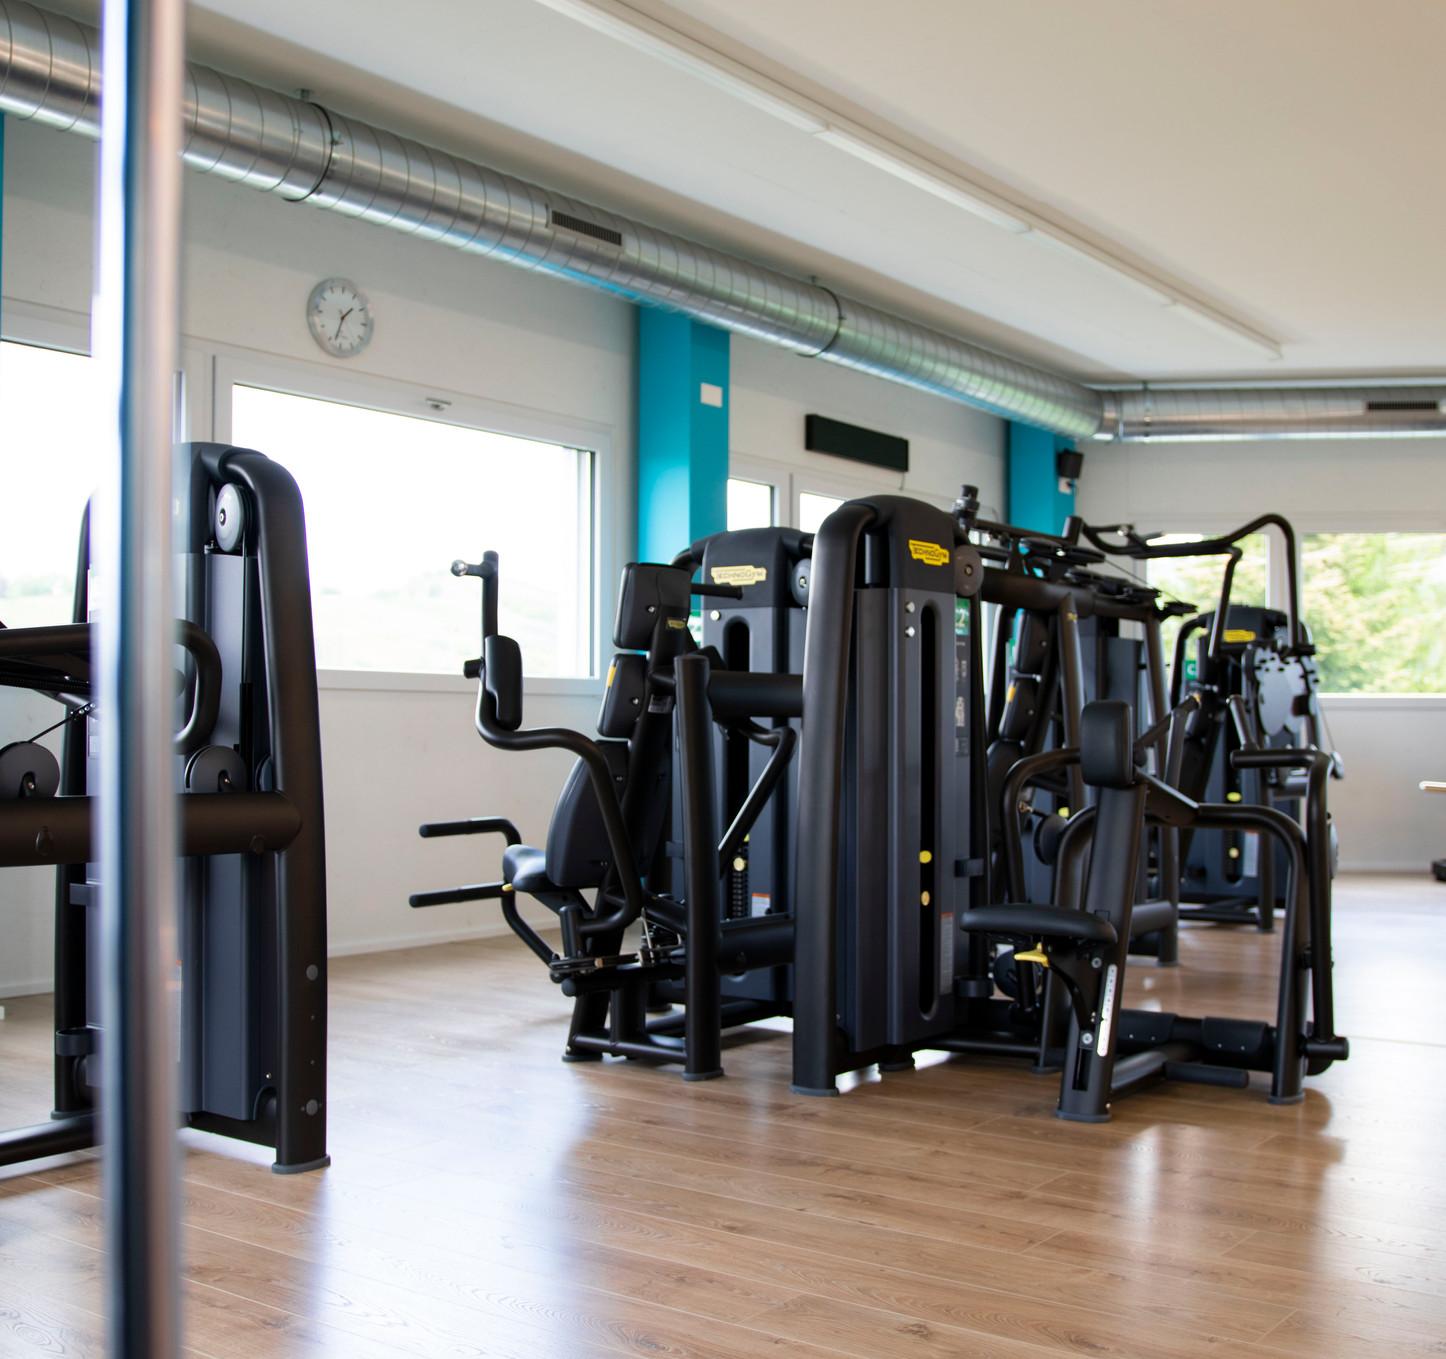 Studio Obergeschoss infiniti fitness